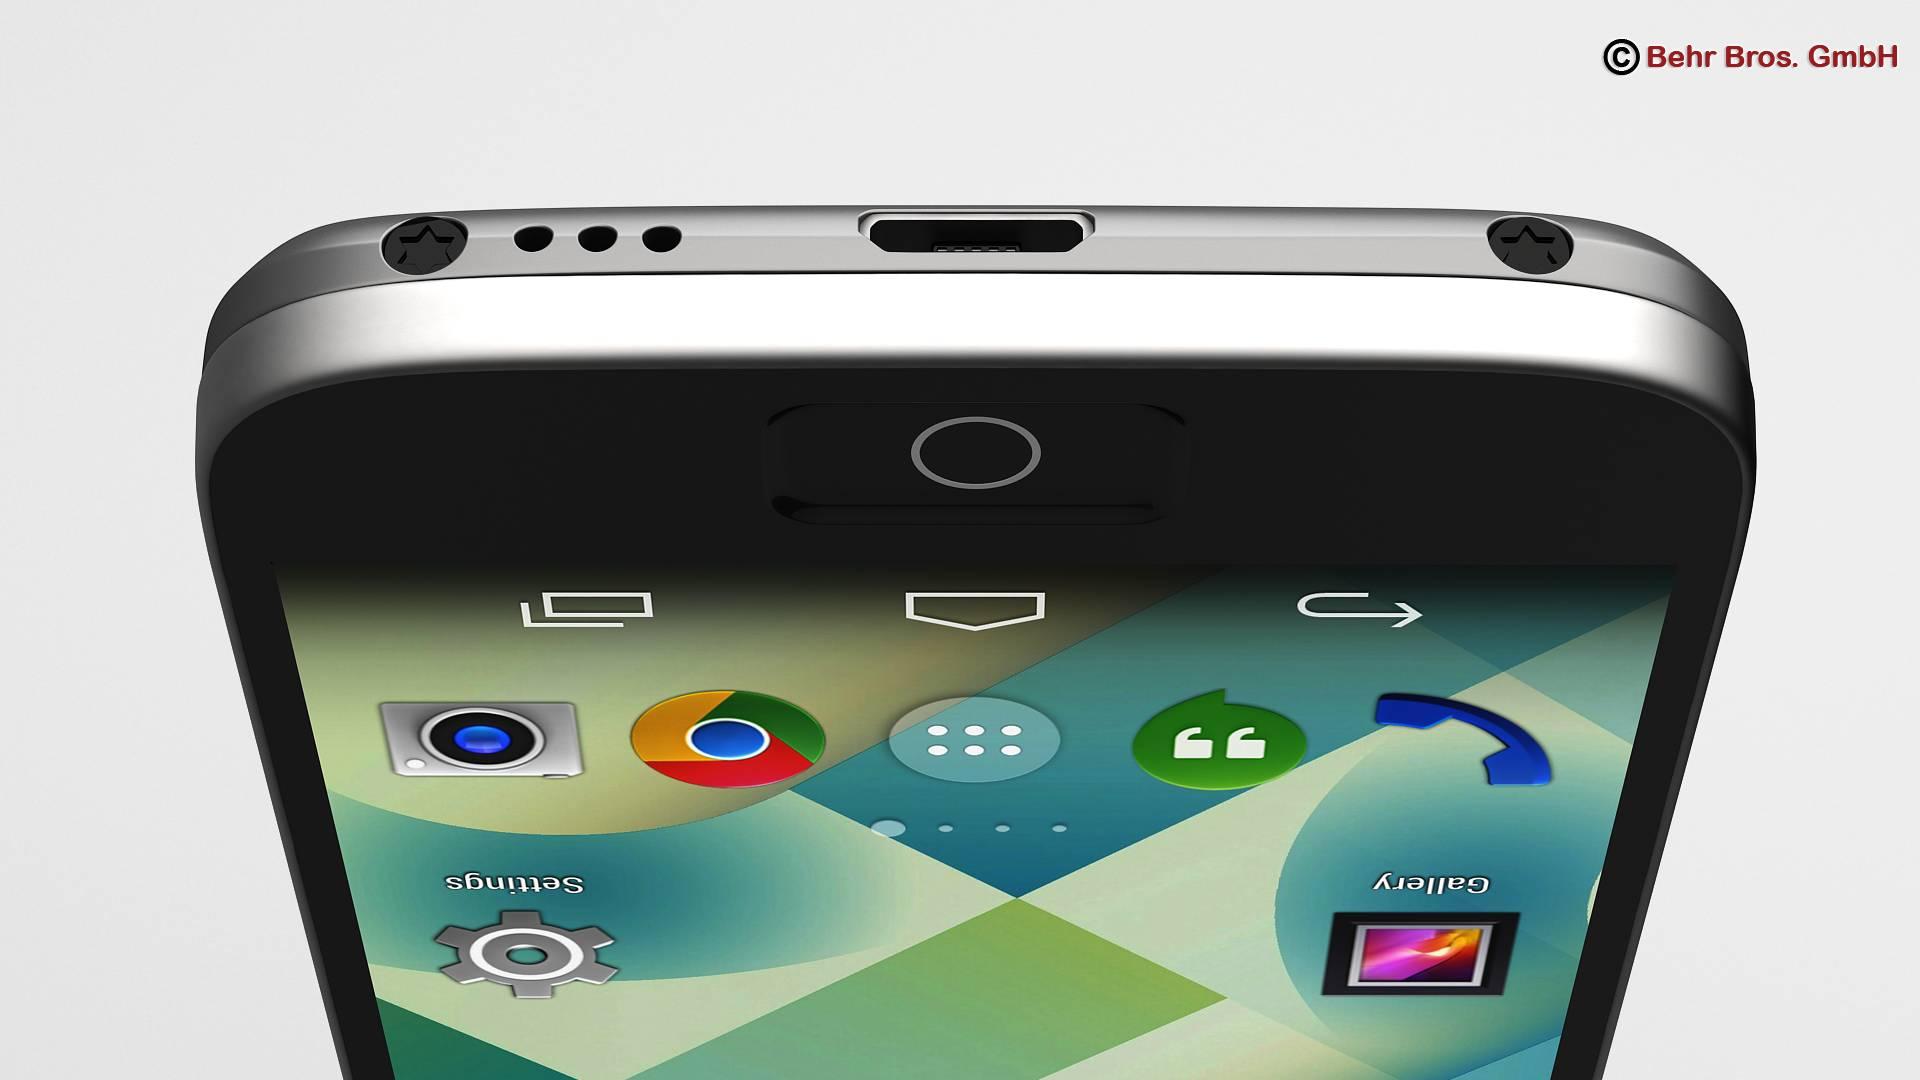 generic smartphone 4 inch 3d model 3ds max fbx c4d lwo ma mb obj 161628